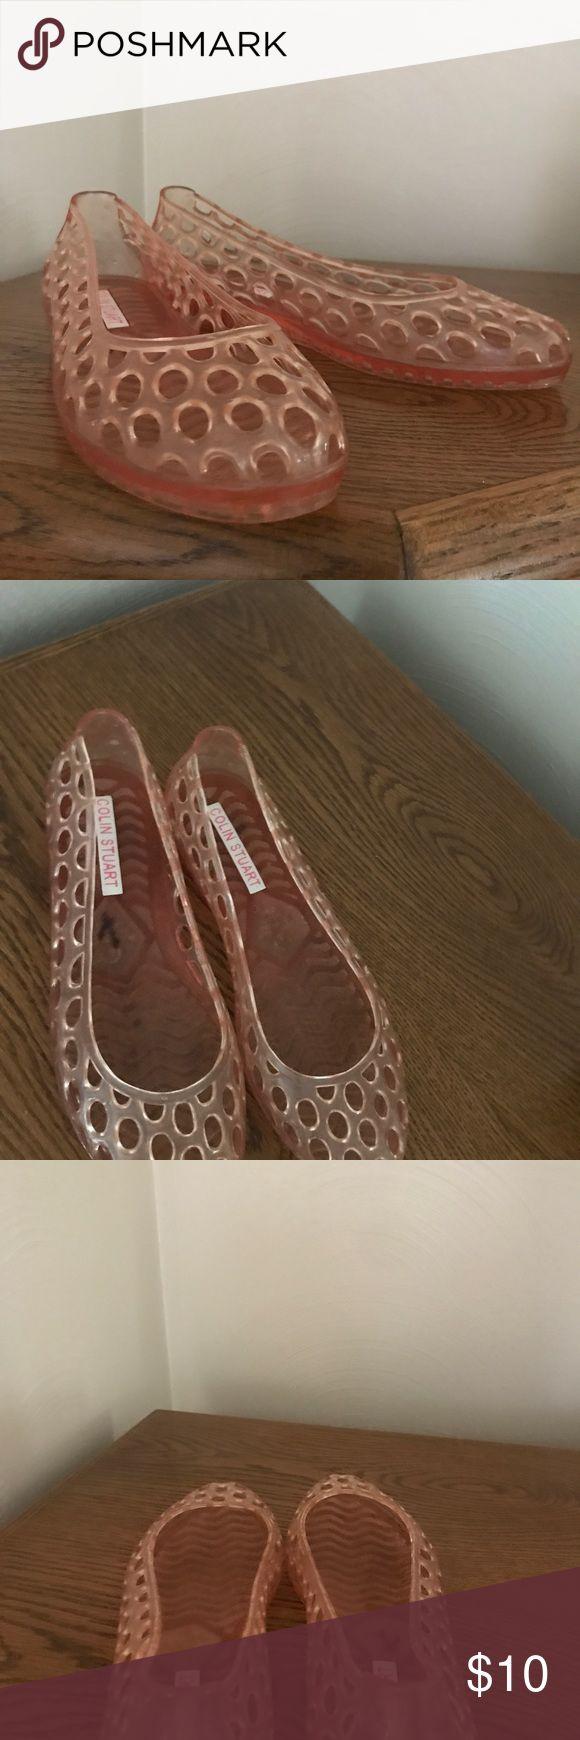 Colin Stuart pink jelly shoes Colin Stuart pink jelly shoes. Lightly-worn, size medium. Colin Stuart Shoes Flats & Loafers